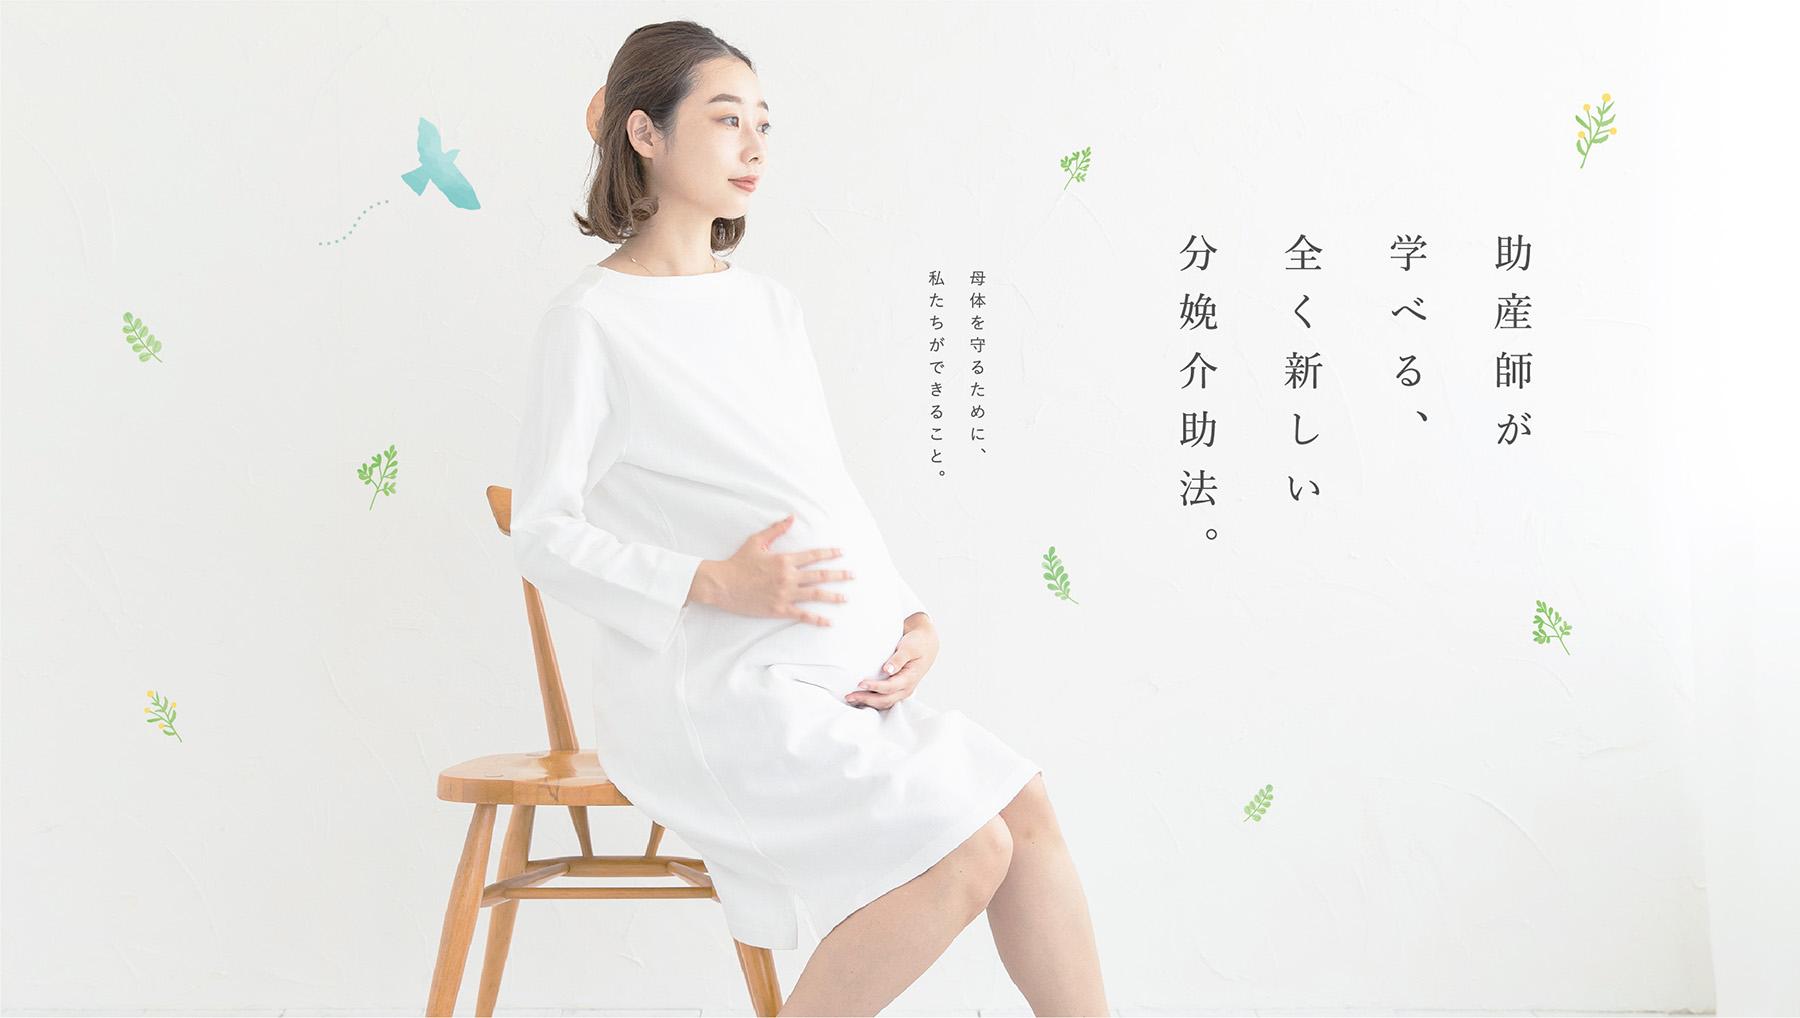 日本骨盤ケア助産学会